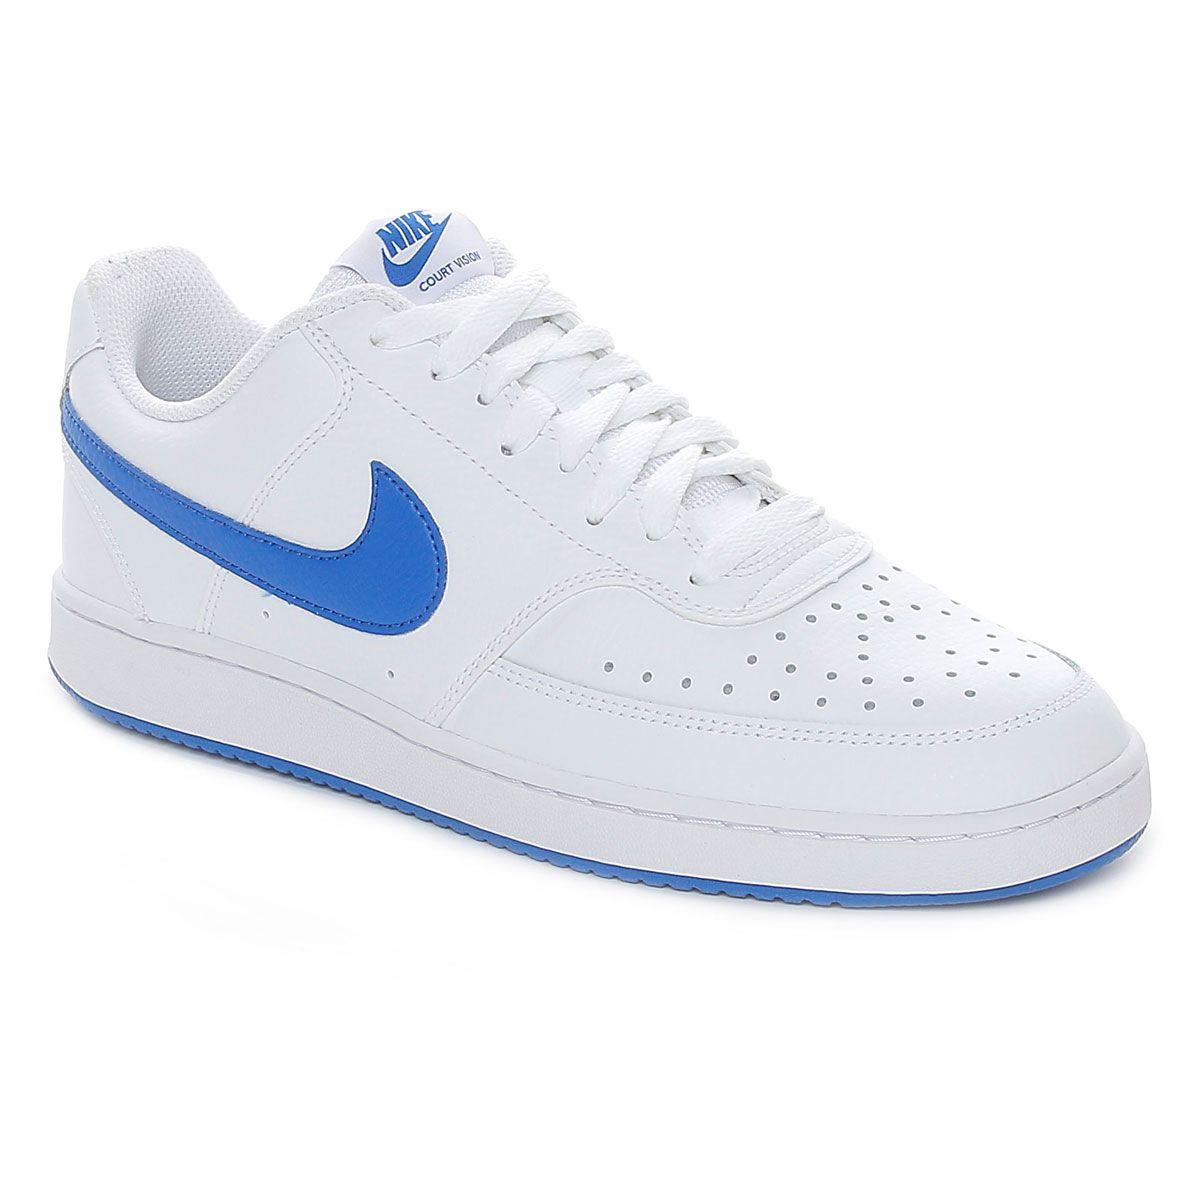 Nike Court Vision Low Uomo Bianco Azzurro